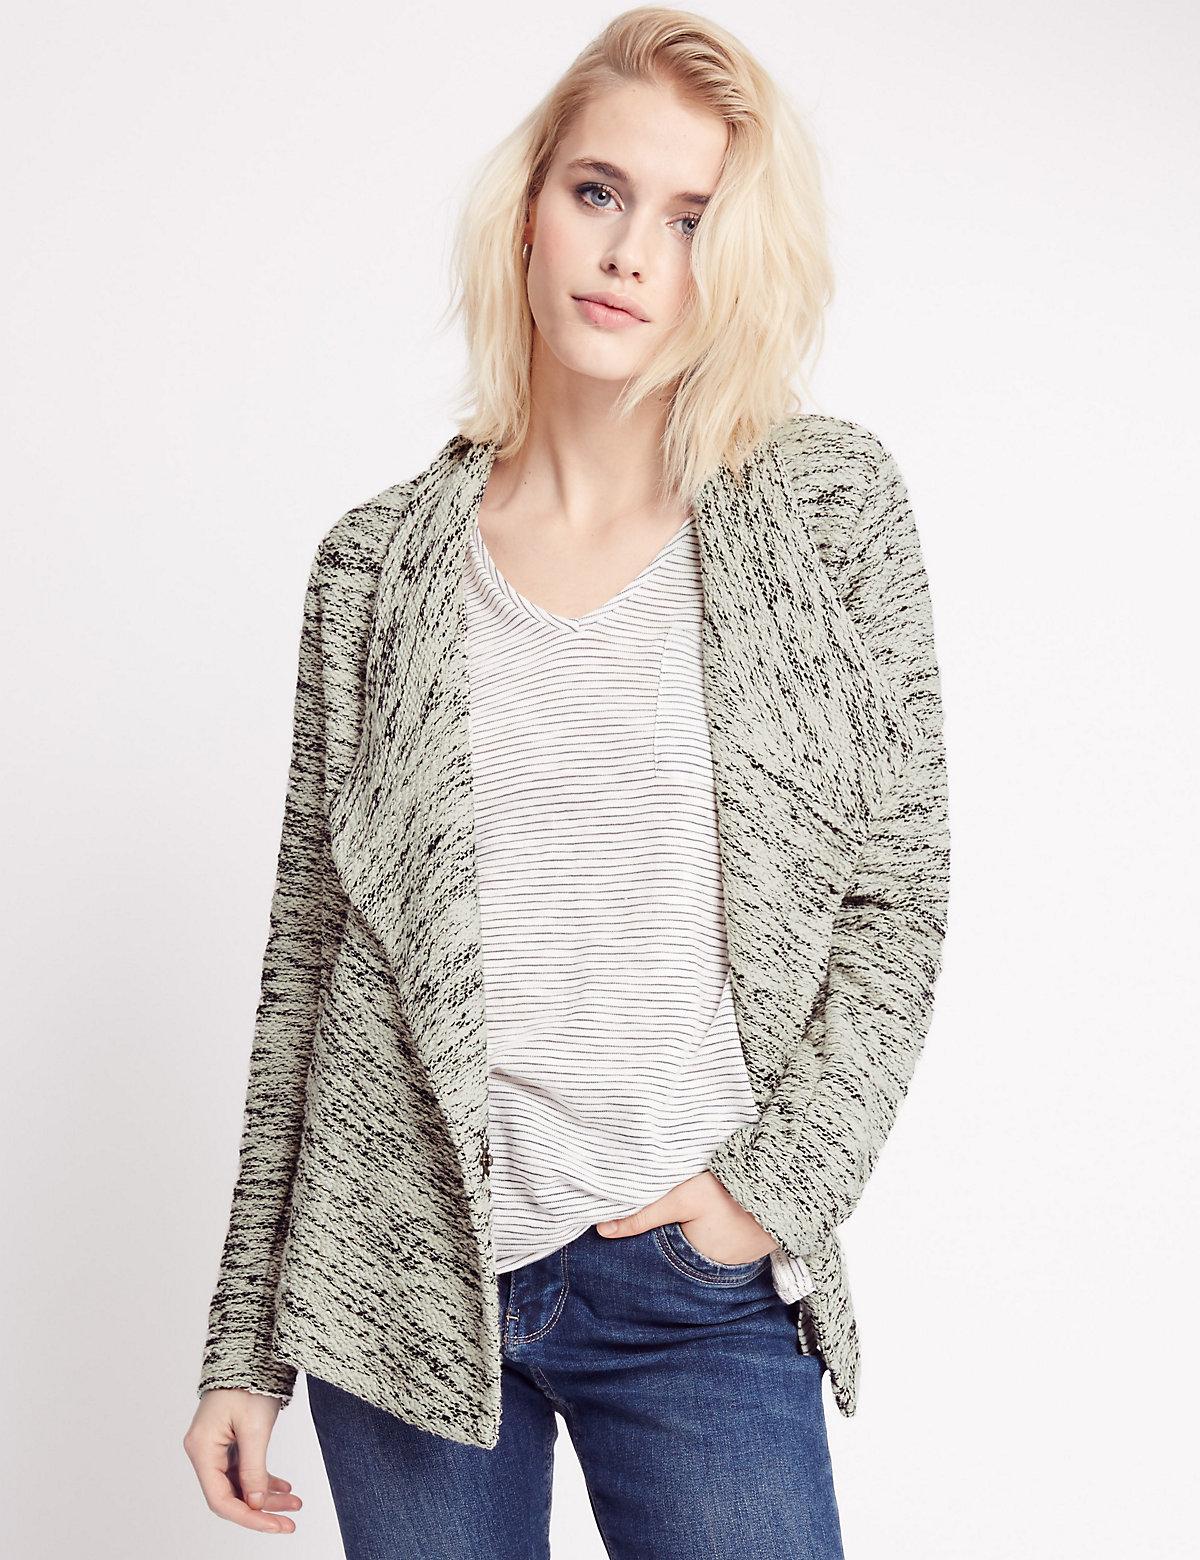 Indigo Collection Warm Handle Boucle Long Sleeve Jersey Top